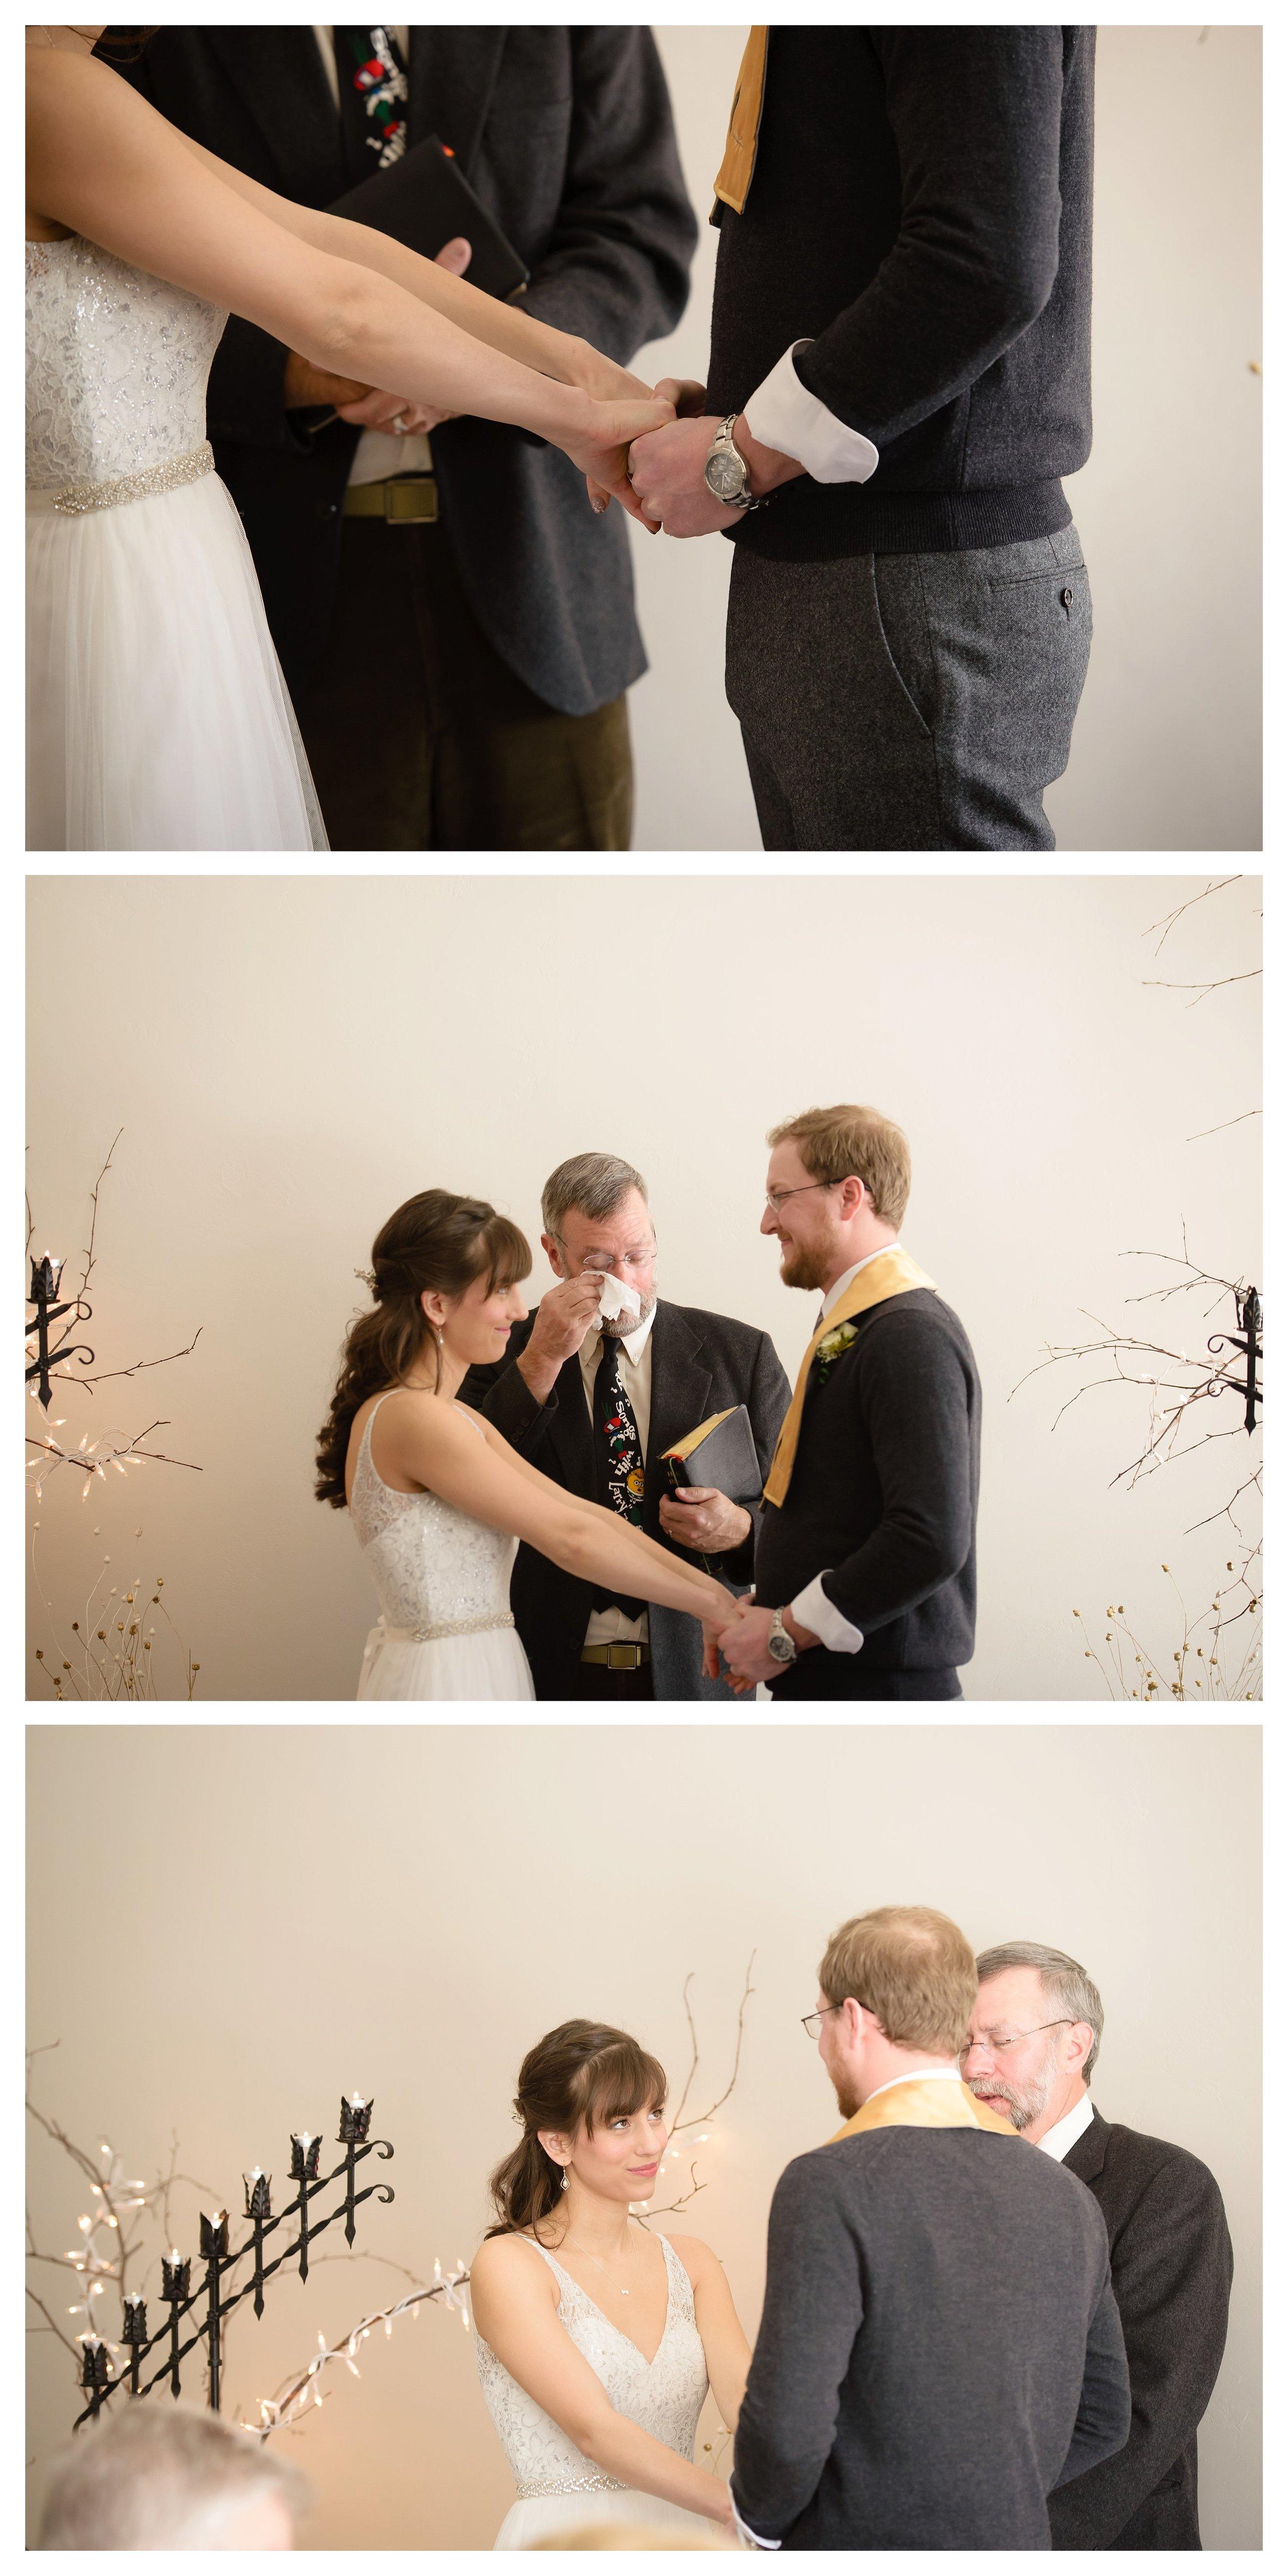 wisconsin wedding photographer timber baron inn bayfield wi ps 139 photography jen jensen_0204.jpg